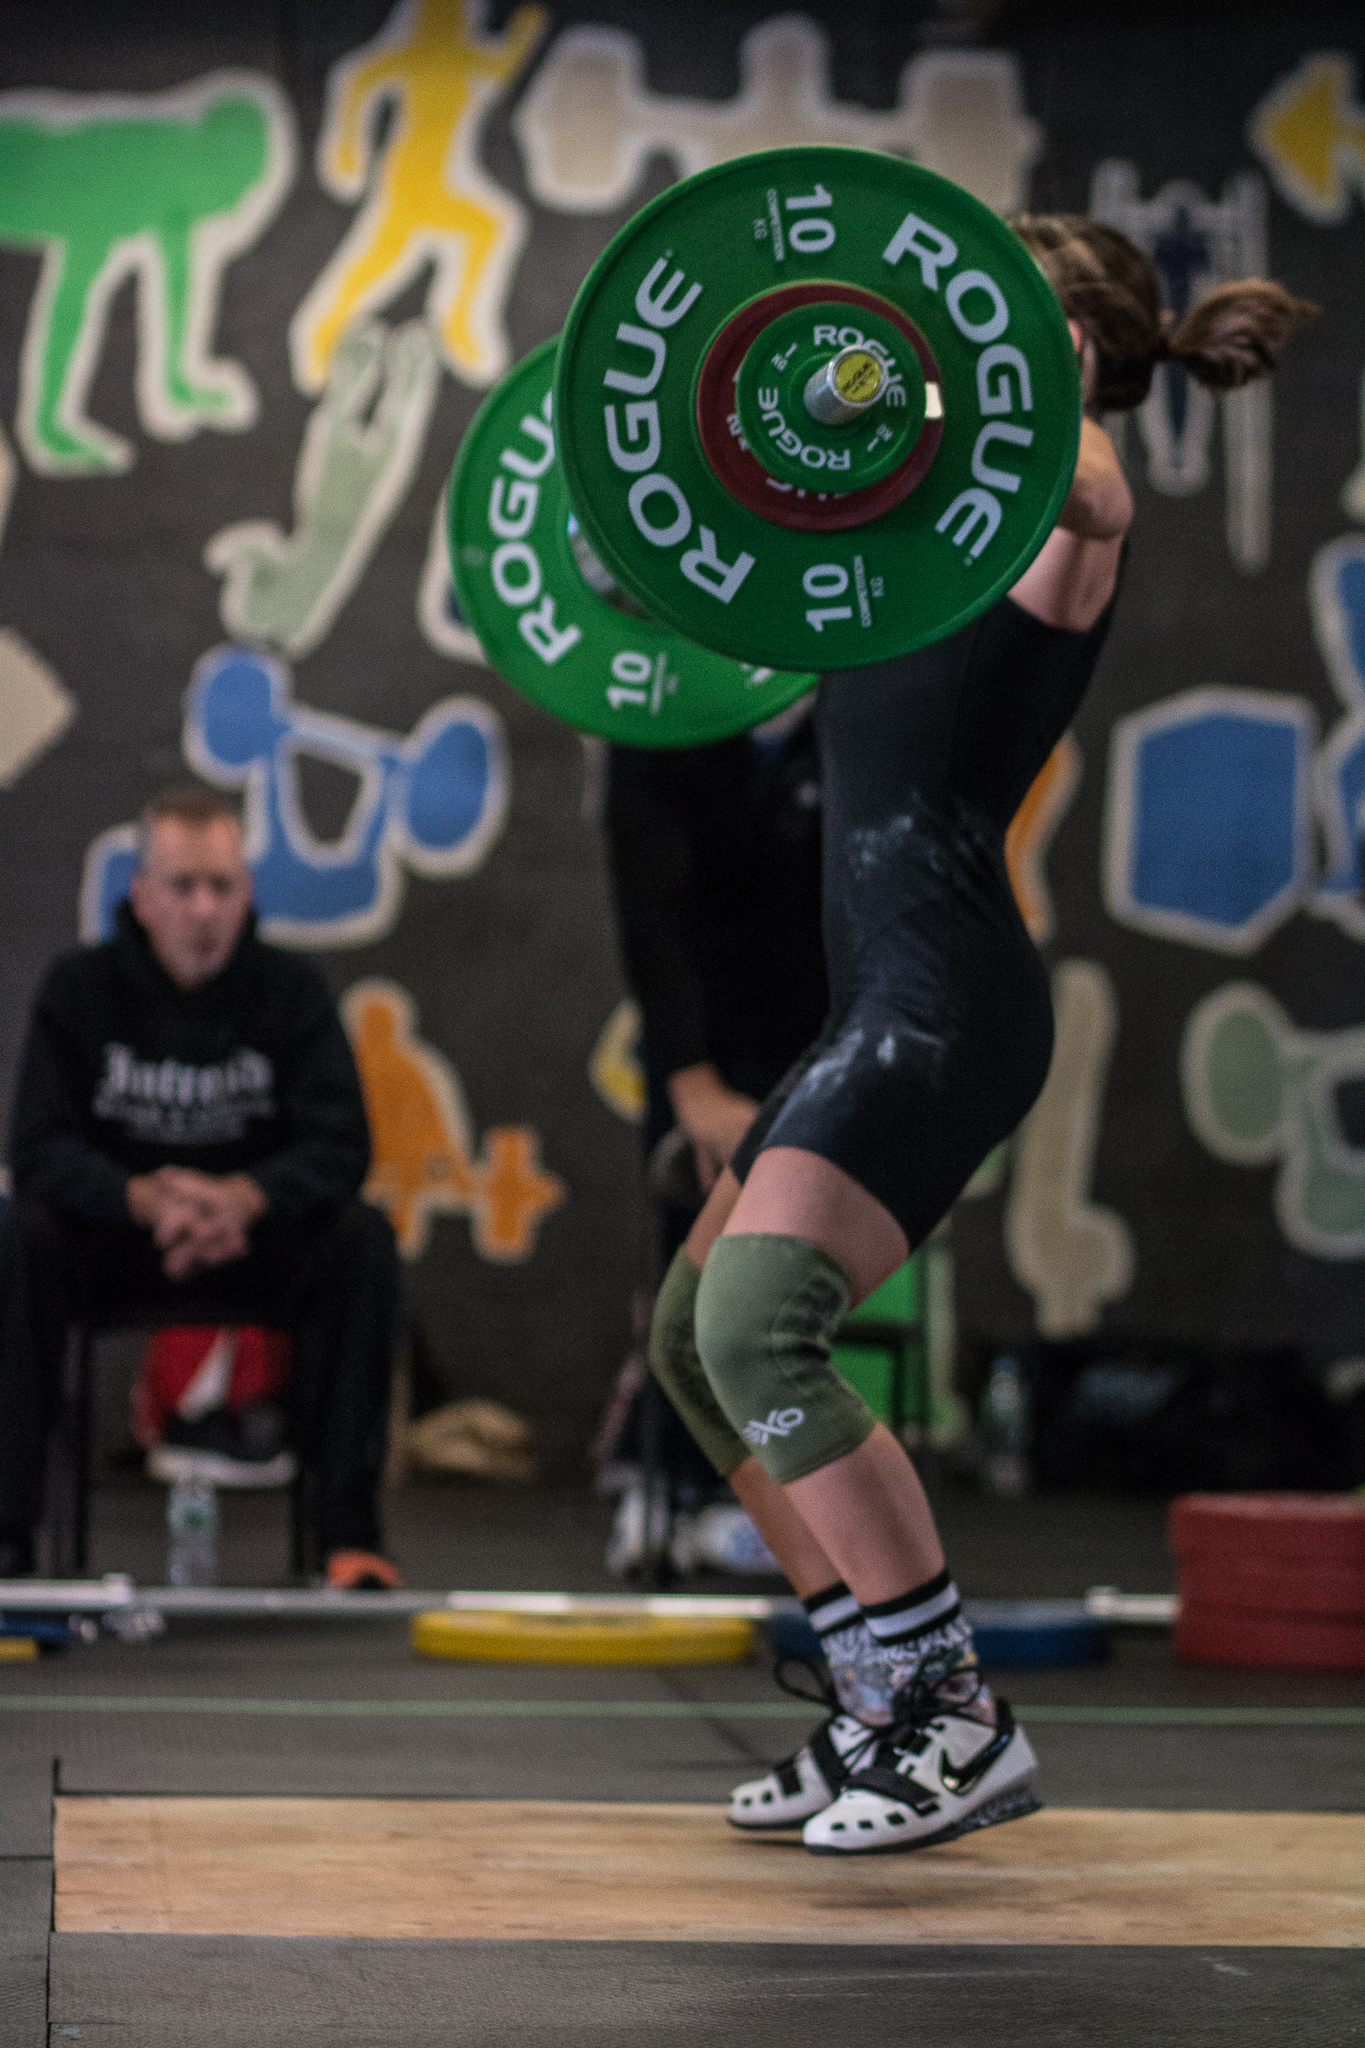 4-men-warwick-new-york-intrepid-strength-conditioning-winter-open-weightlifting-meet-weightlifting-photography (4 of 7).jpg